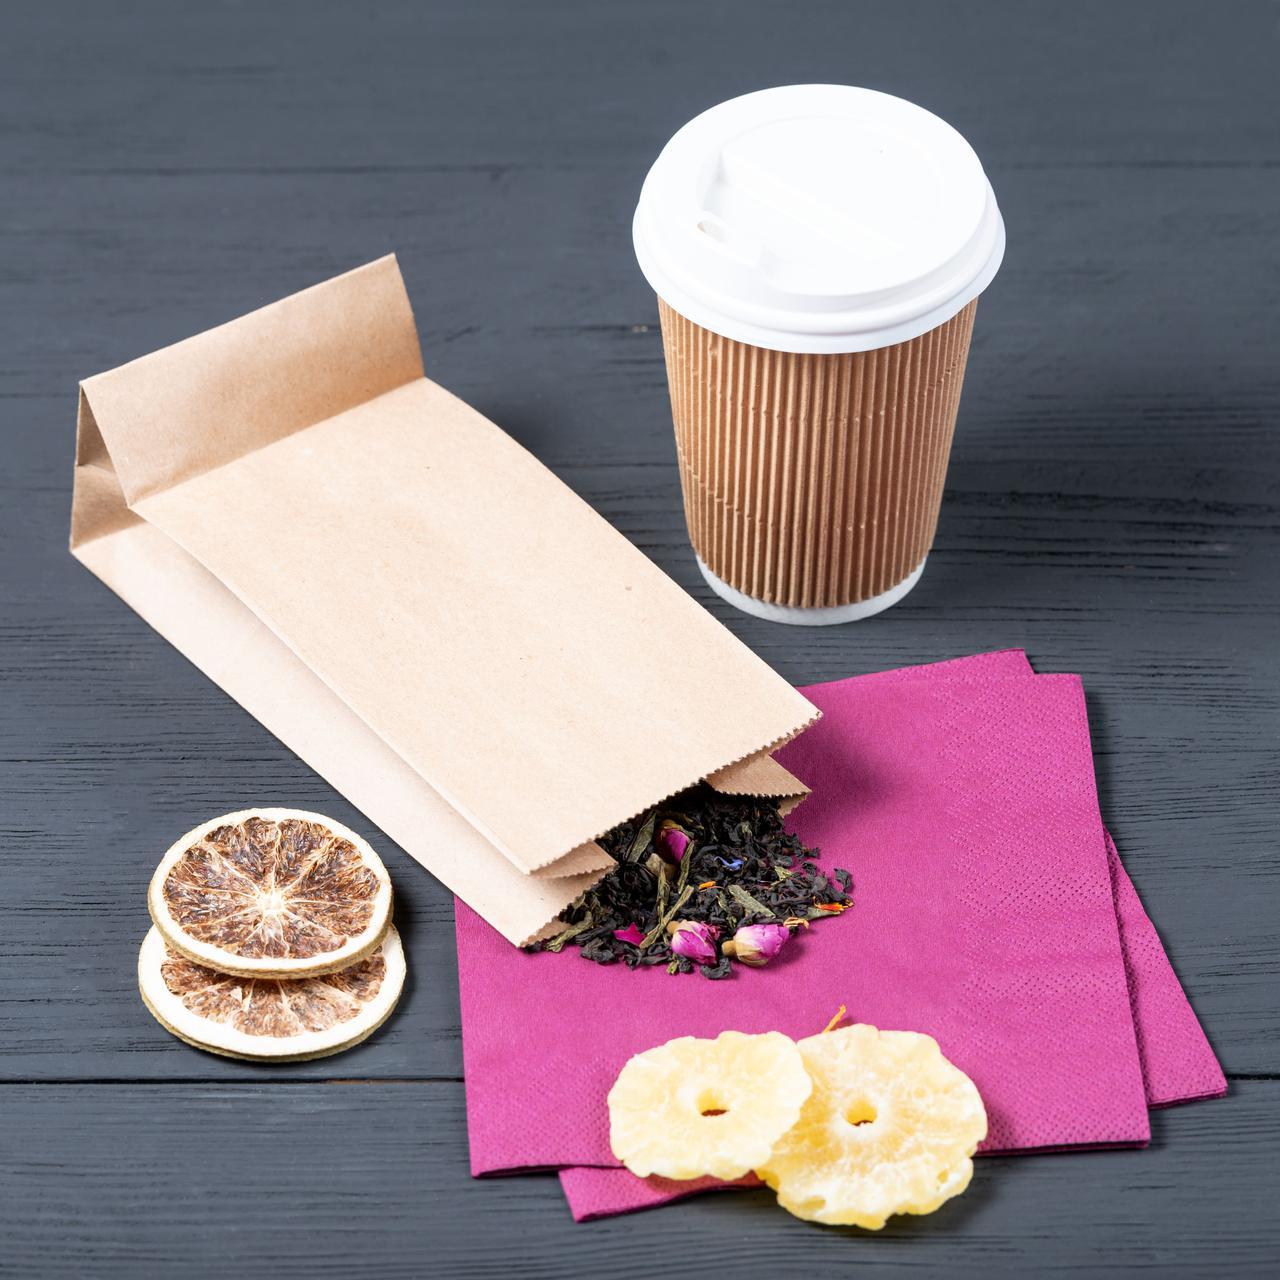 Пакет с дном бумажный 95*65*190 мм бурый фасовочный крафт пакет